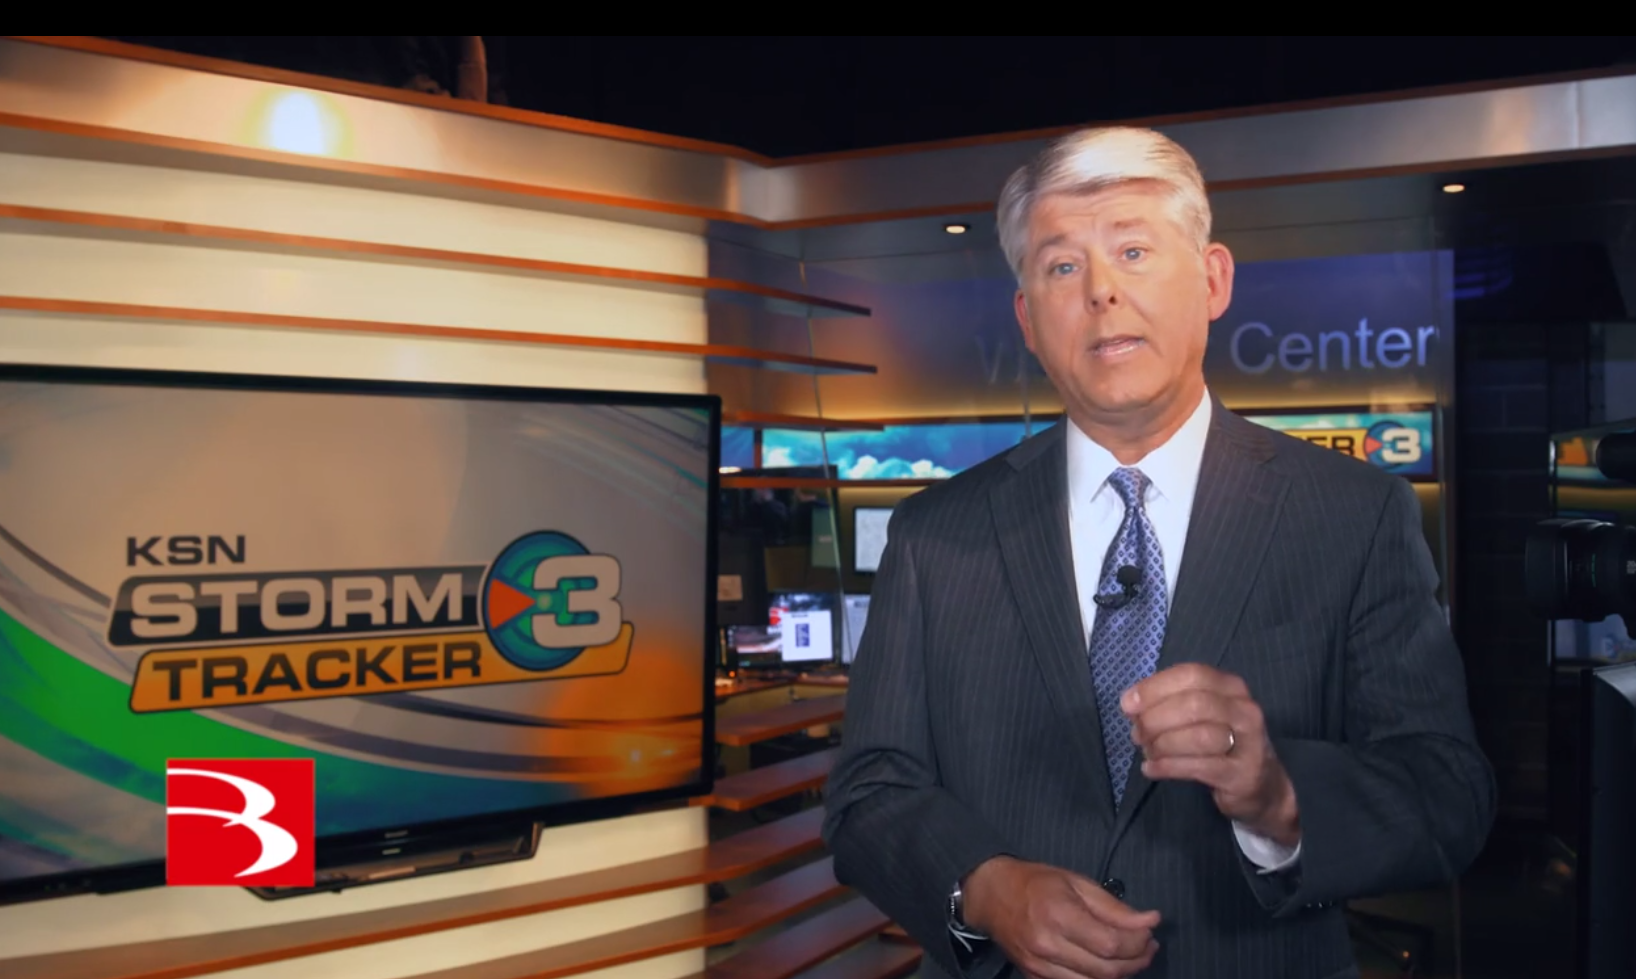 Chief Meteorologist Dave Freeman, with KSNW TV in Wichita, Kansas